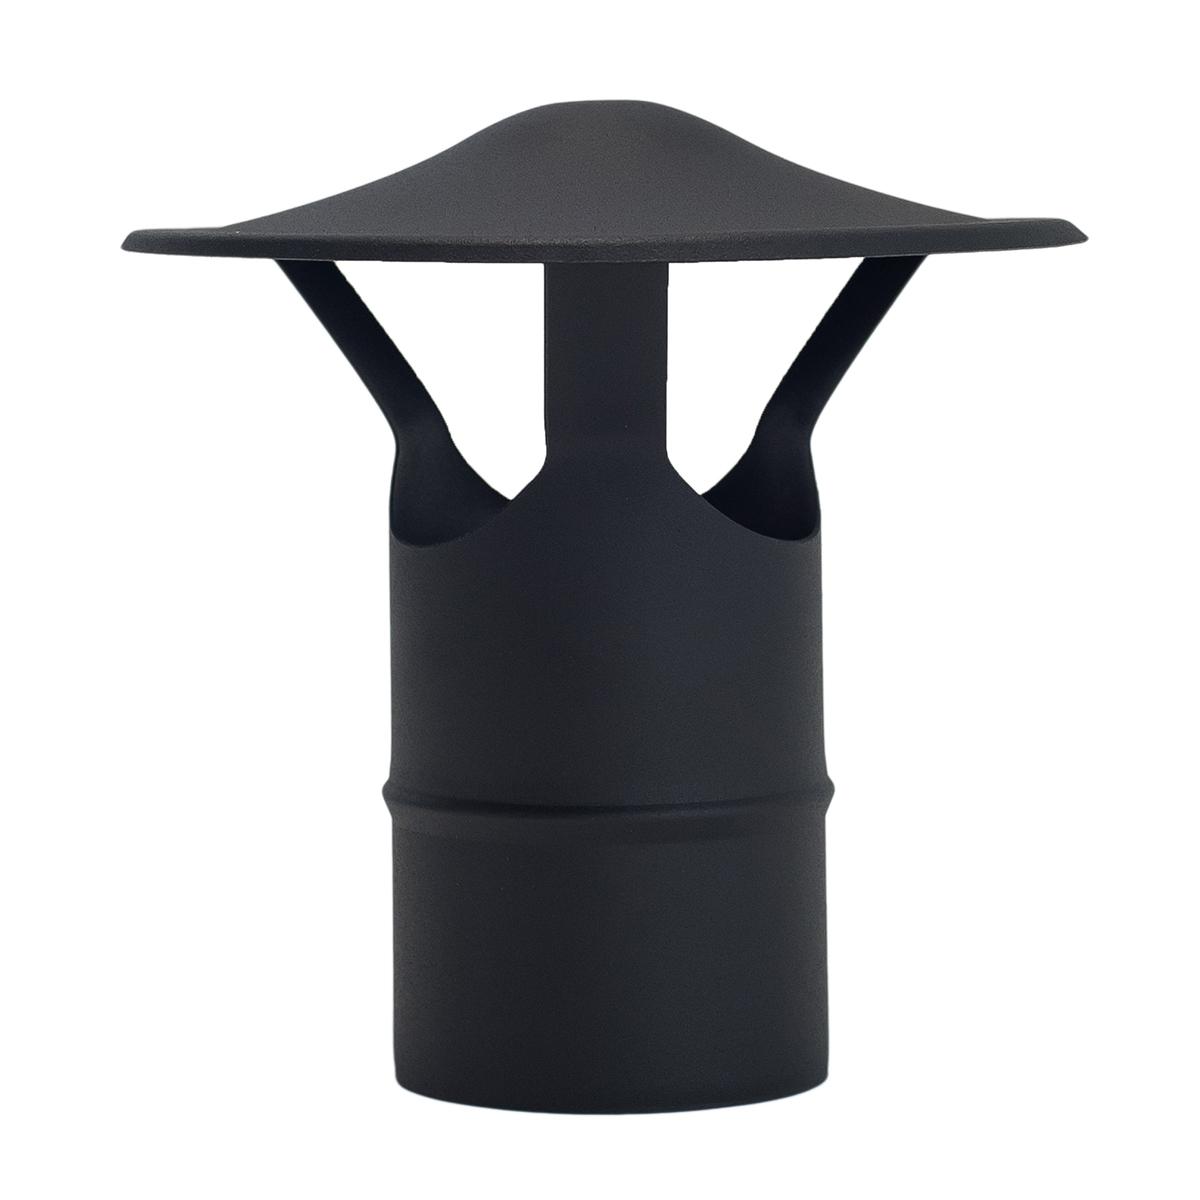 Sombrerete chino vitrificado negro mate